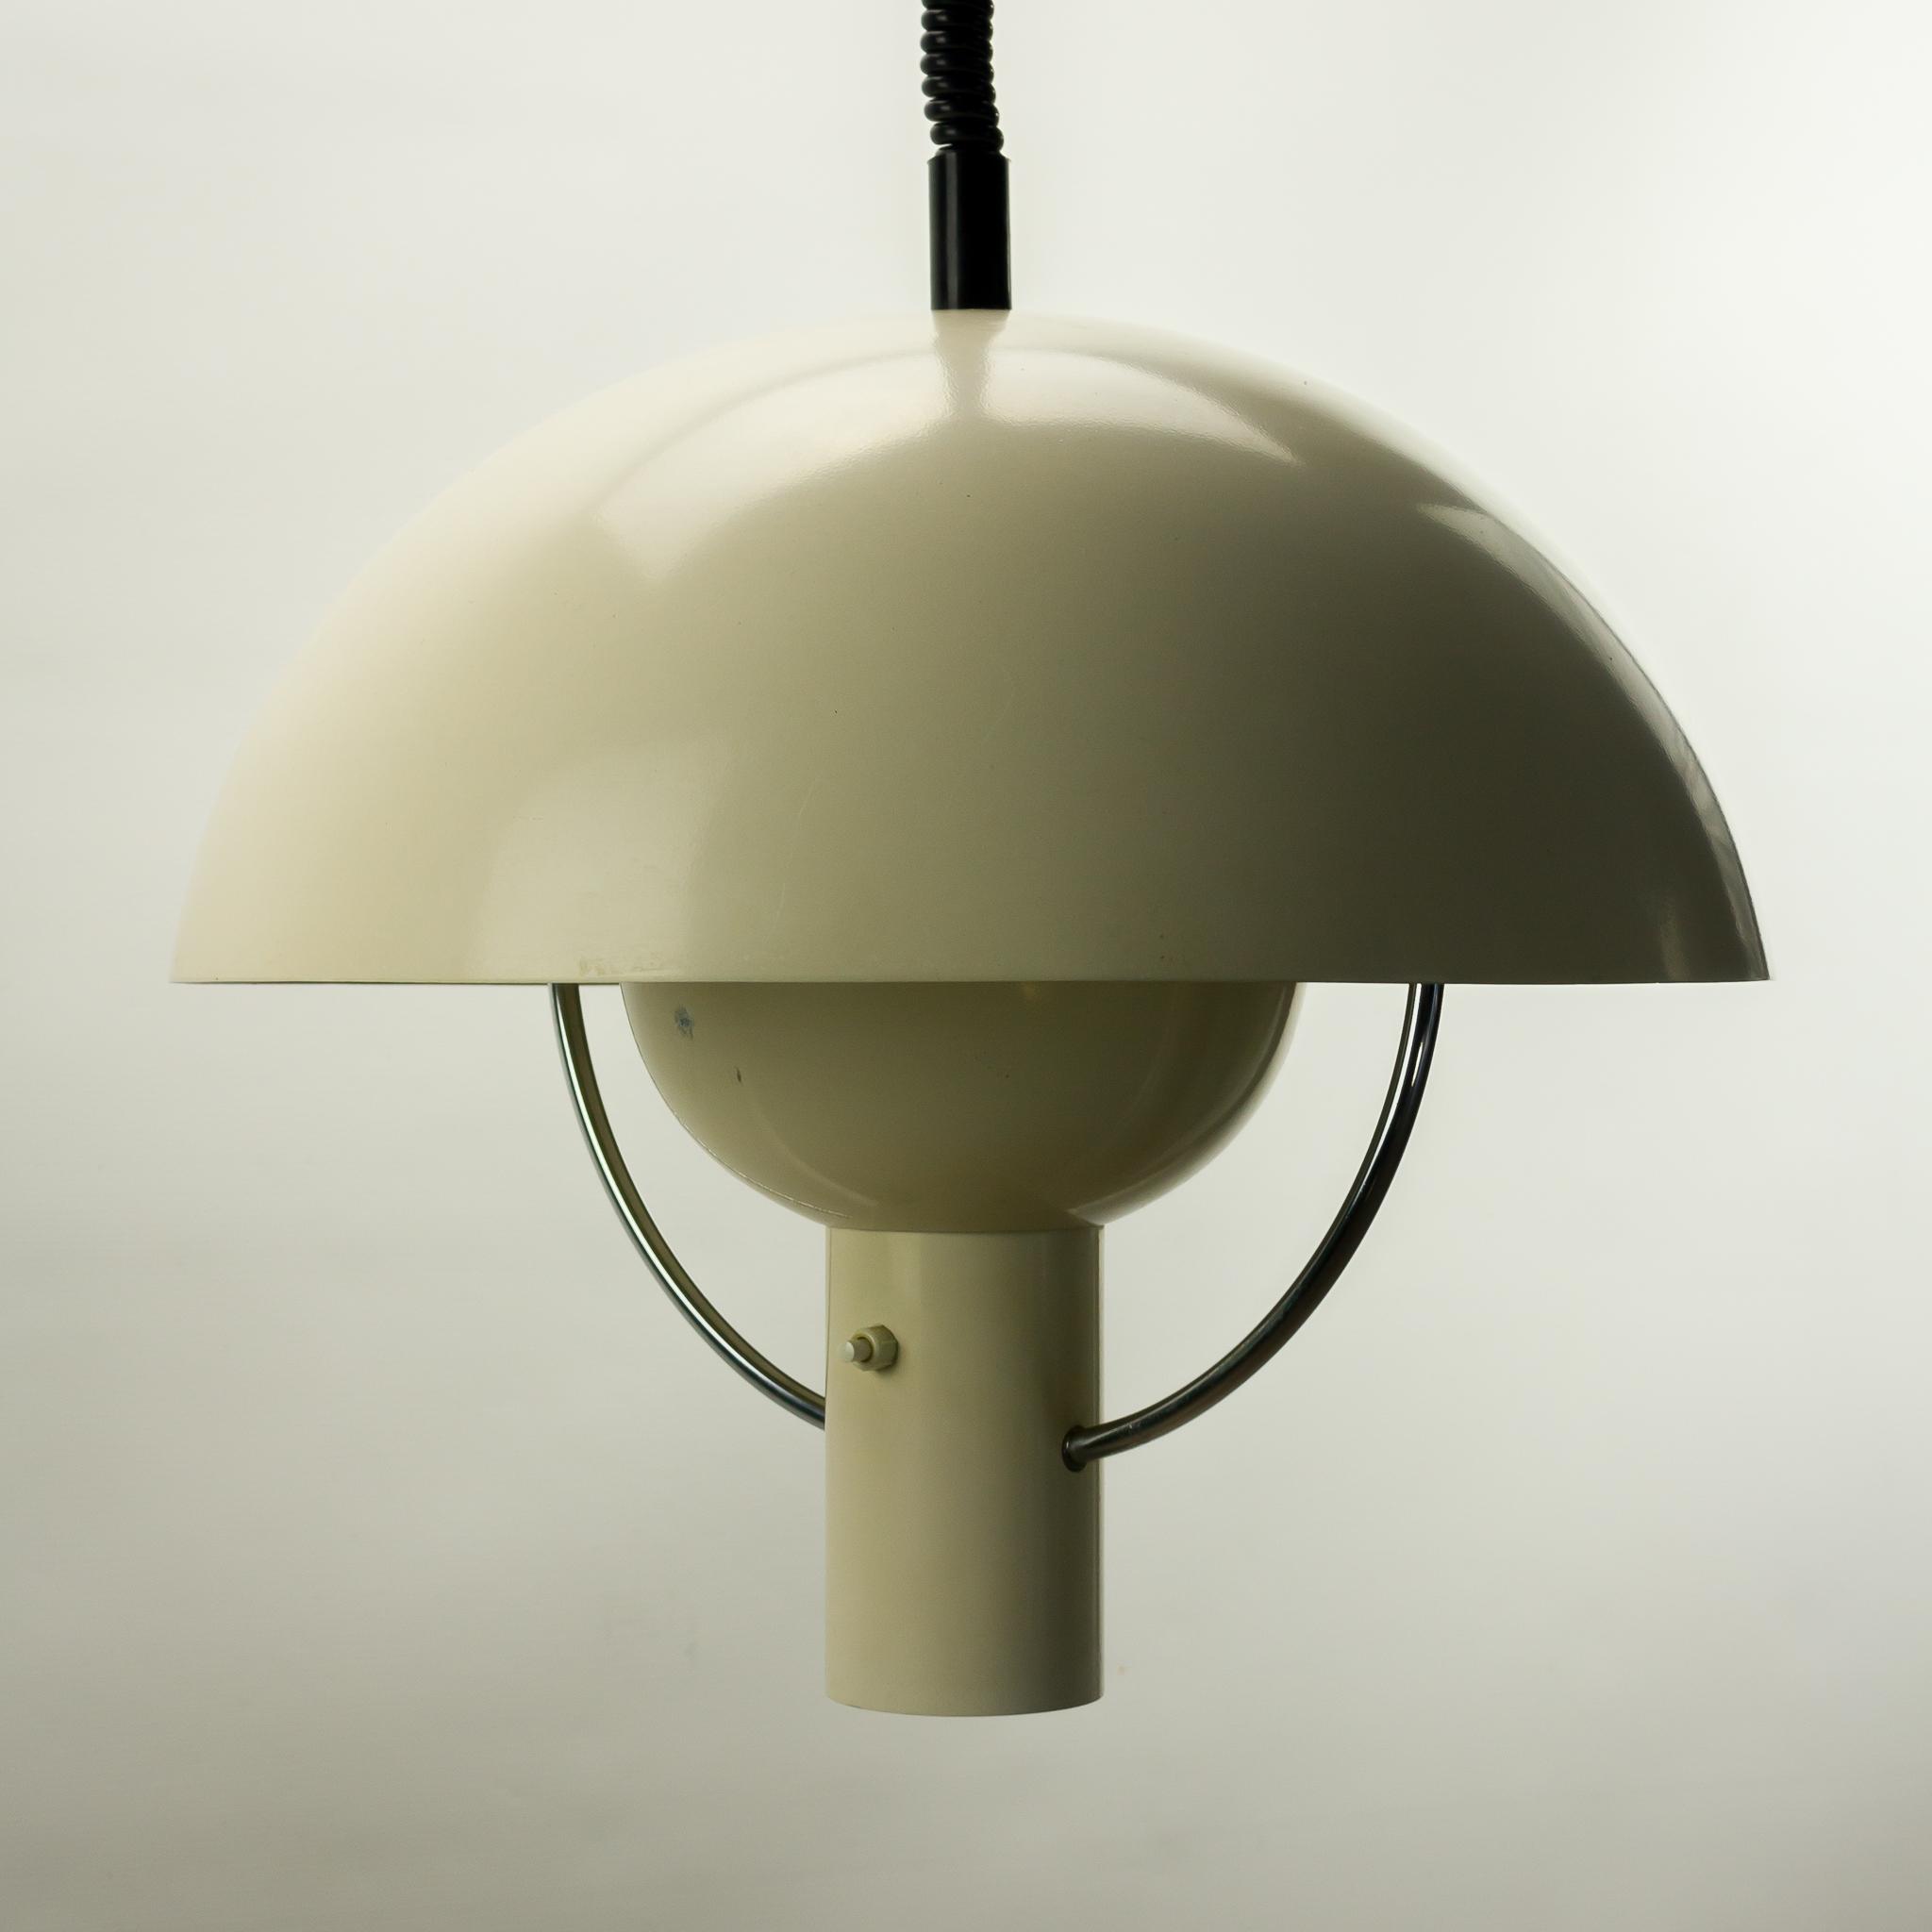 60 s dijkstra lampen metalen paddestoel hanglamp barbmama. Black Bedroom Furniture Sets. Home Design Ideas